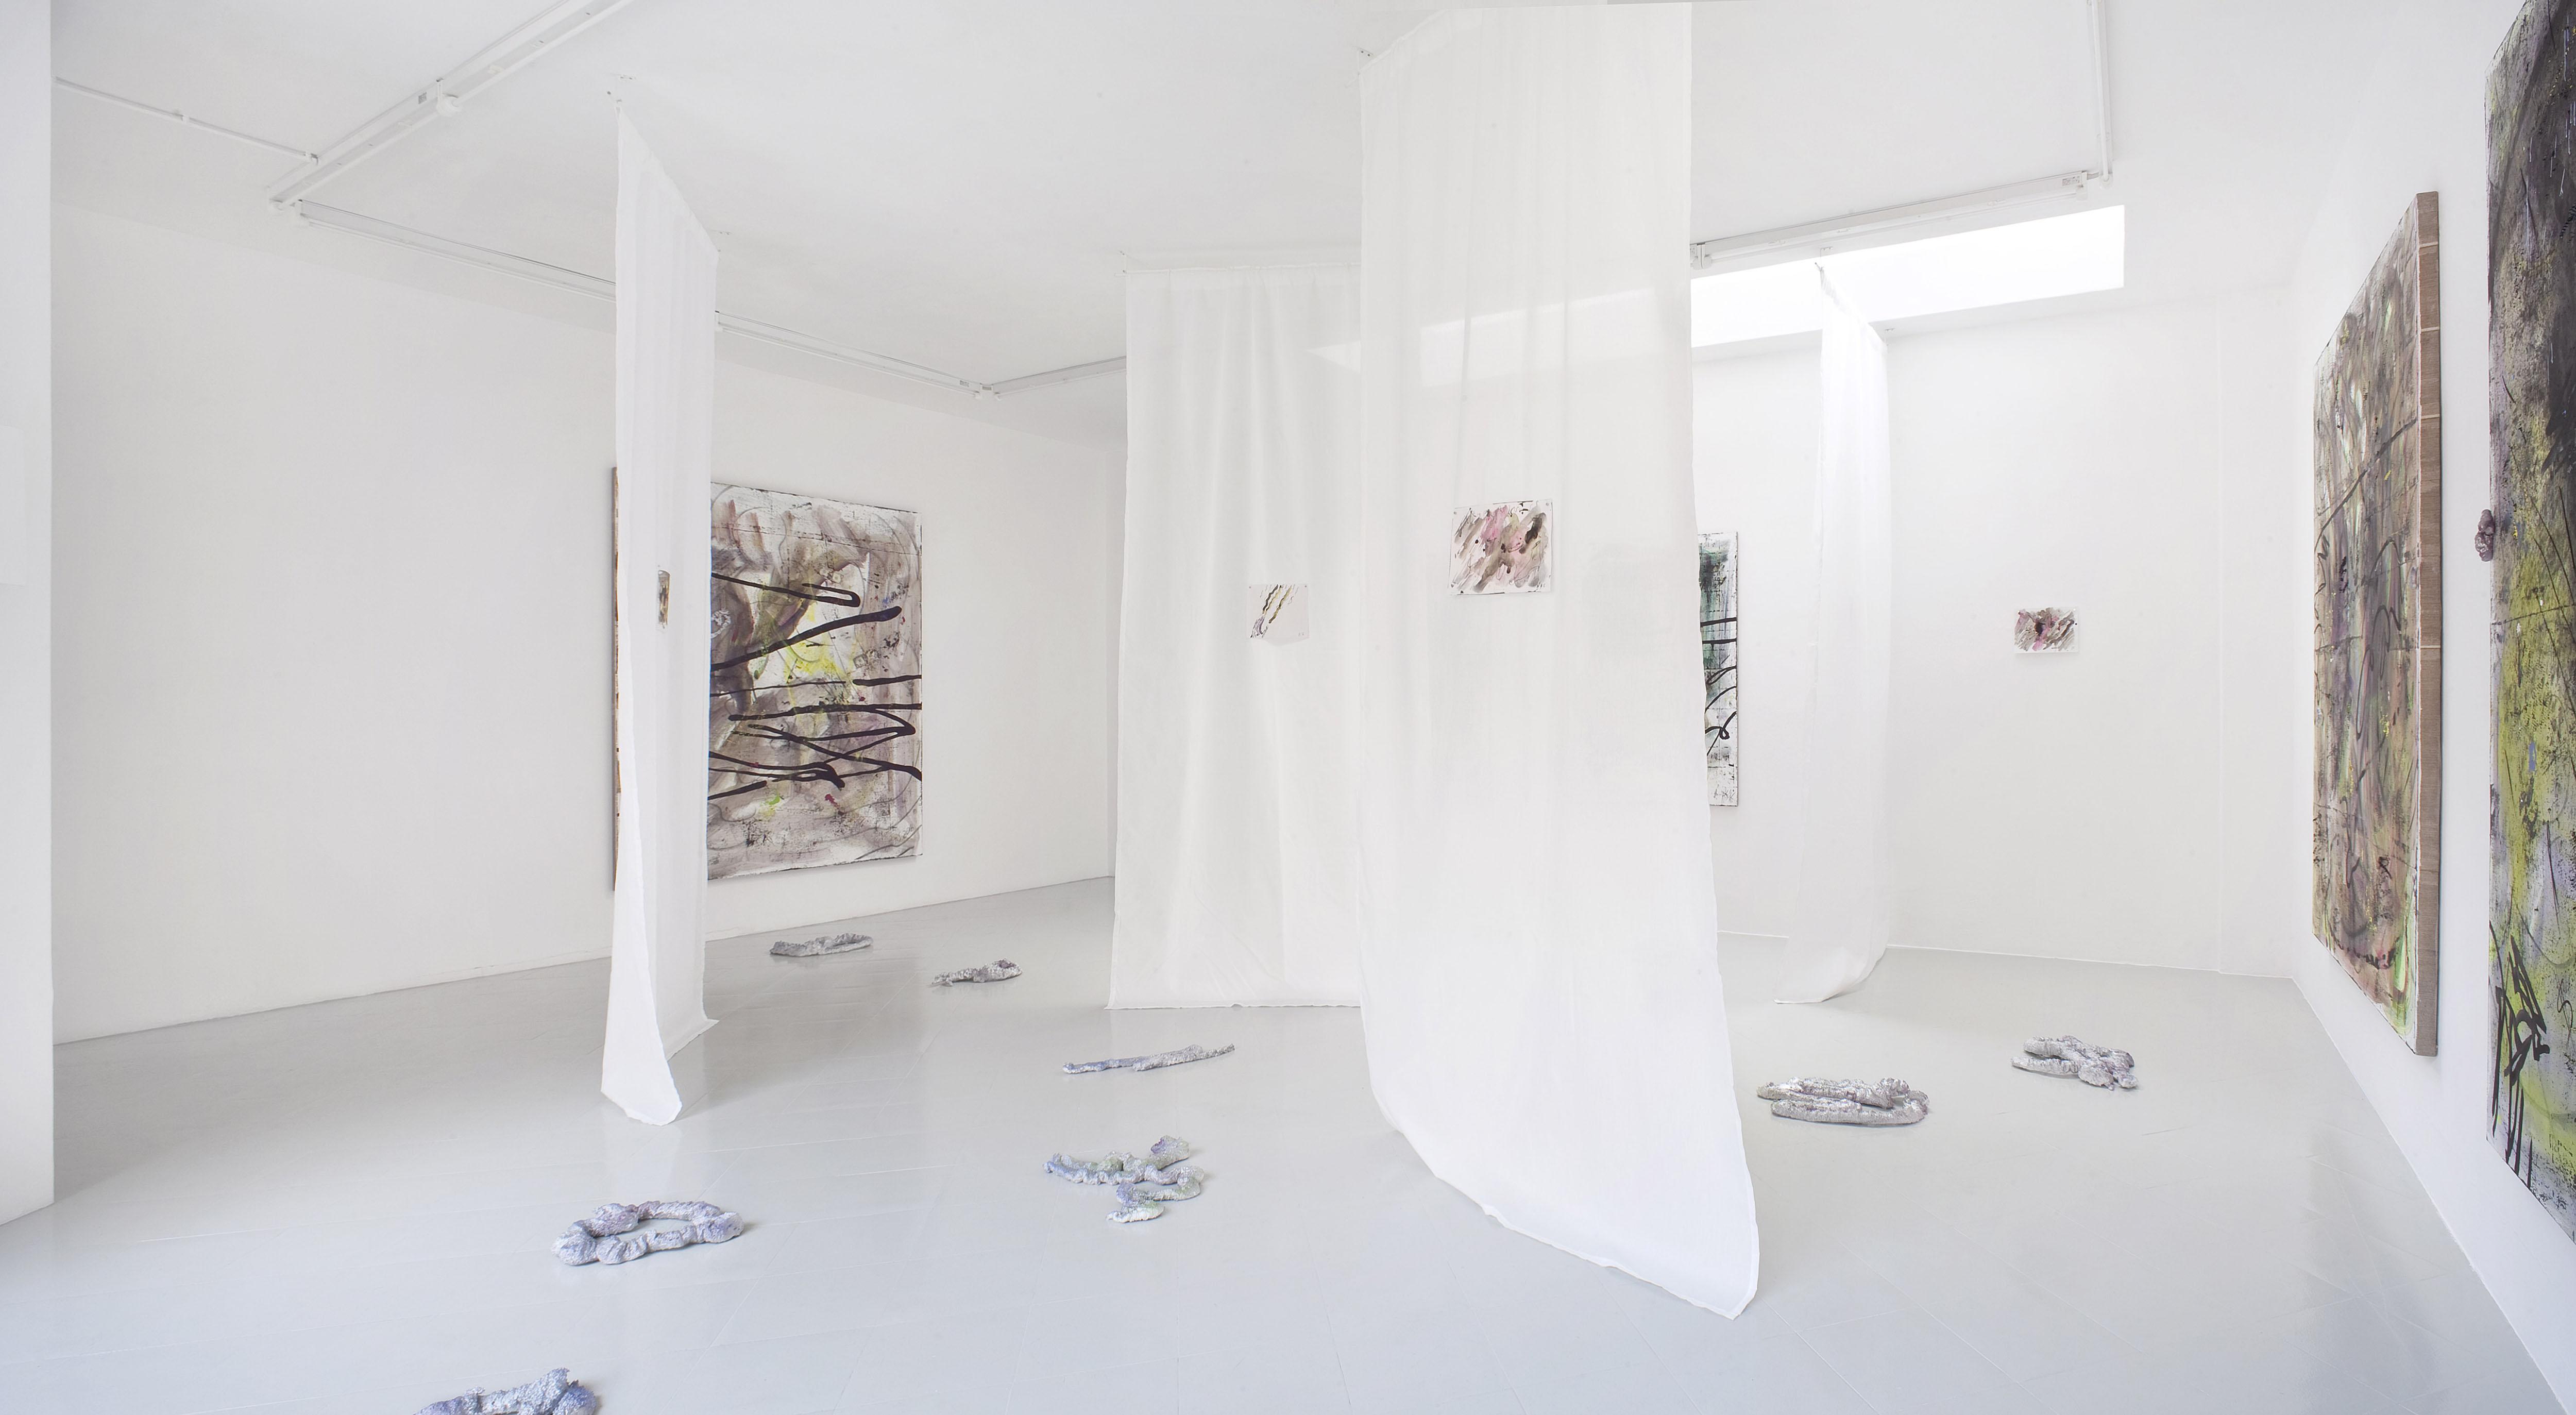 11 - Henning Strassburger Superet Exit System Installation View 2016 Studiolo Milan copia 2